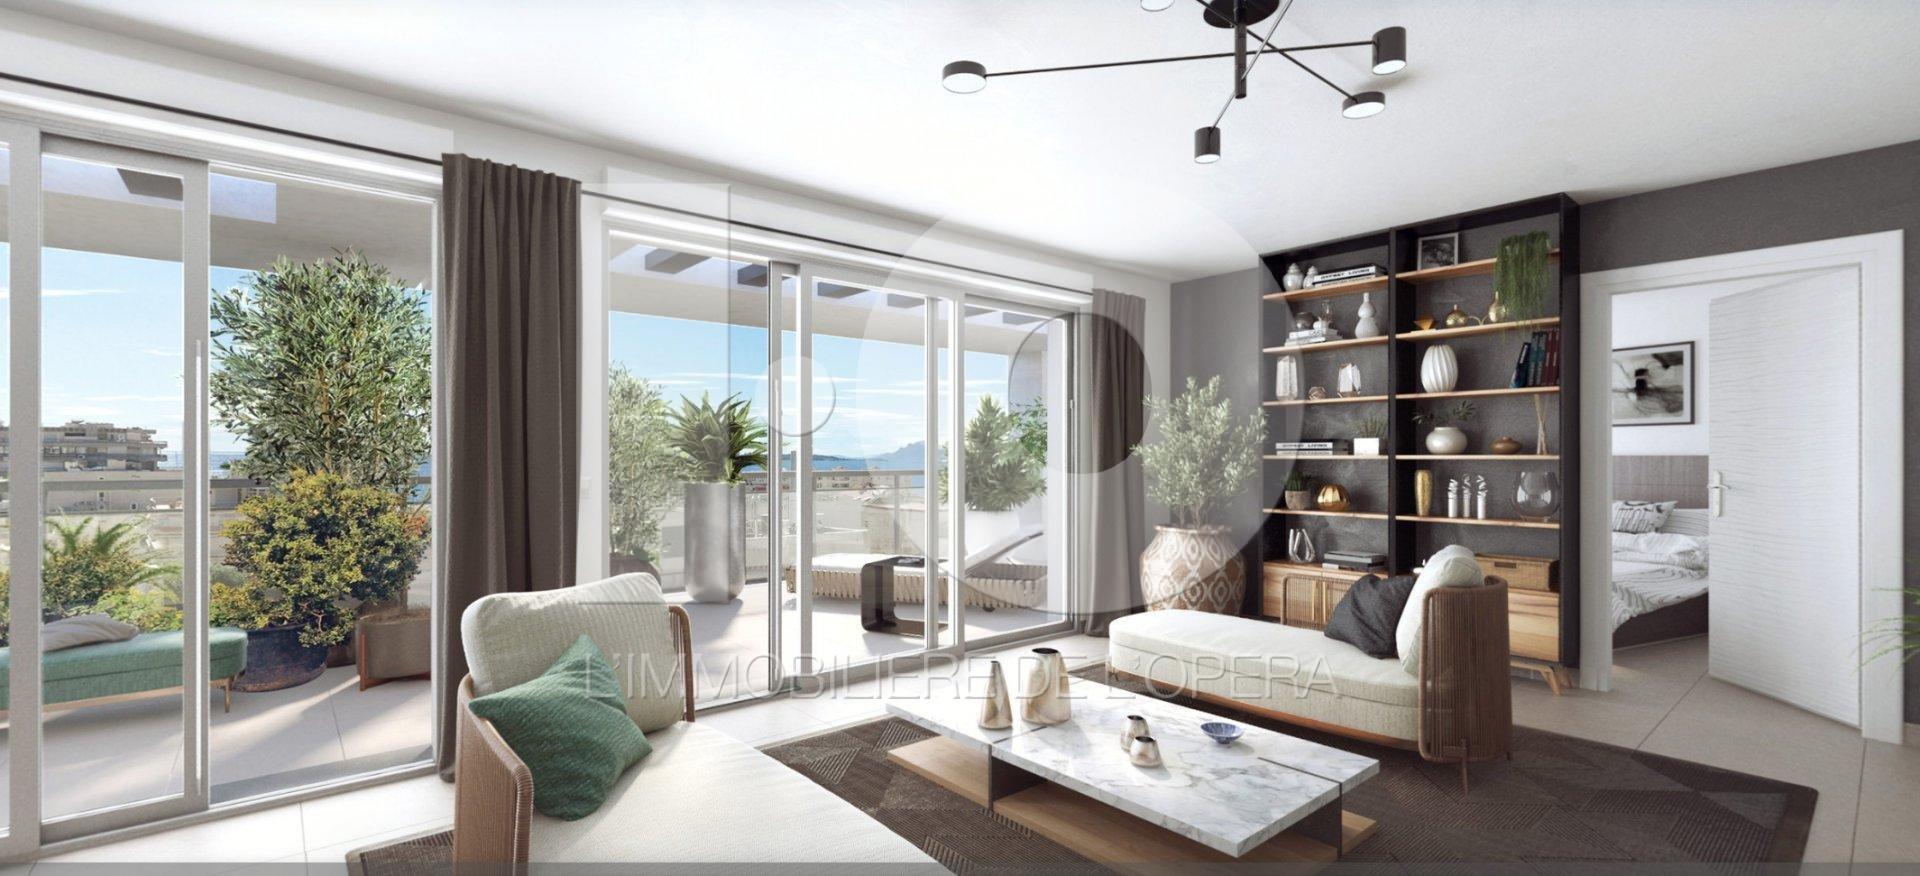 ANTiBES -/ JUAN LES PINS - Appartement de 4 Pièces 100 m2 - Terrasses RoofTop